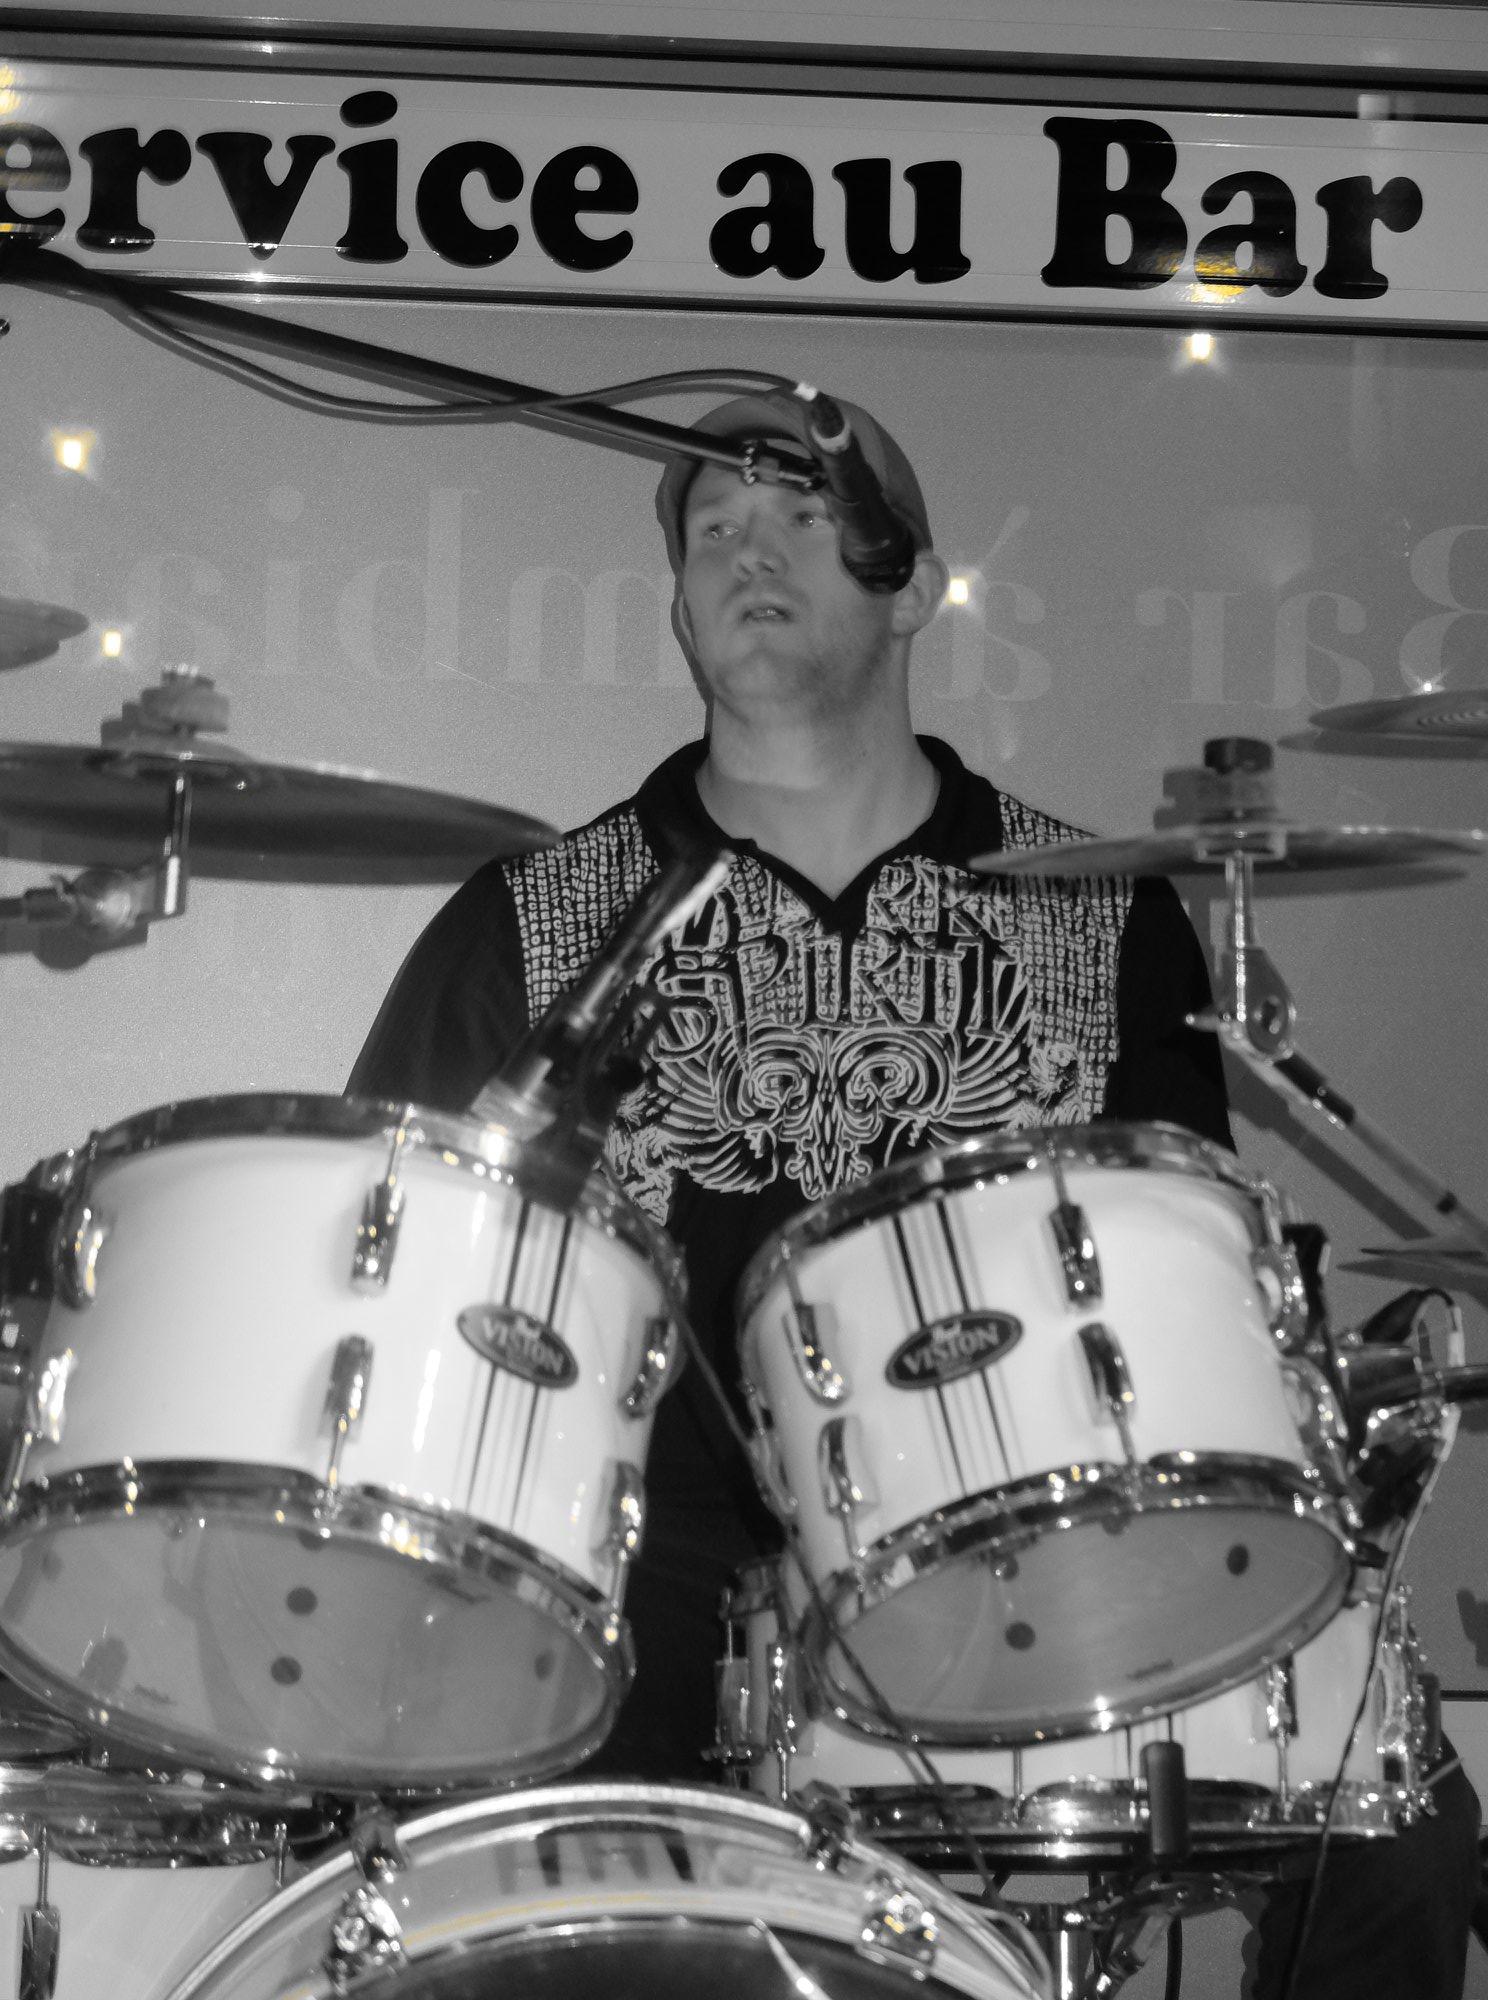 Cedric on drums